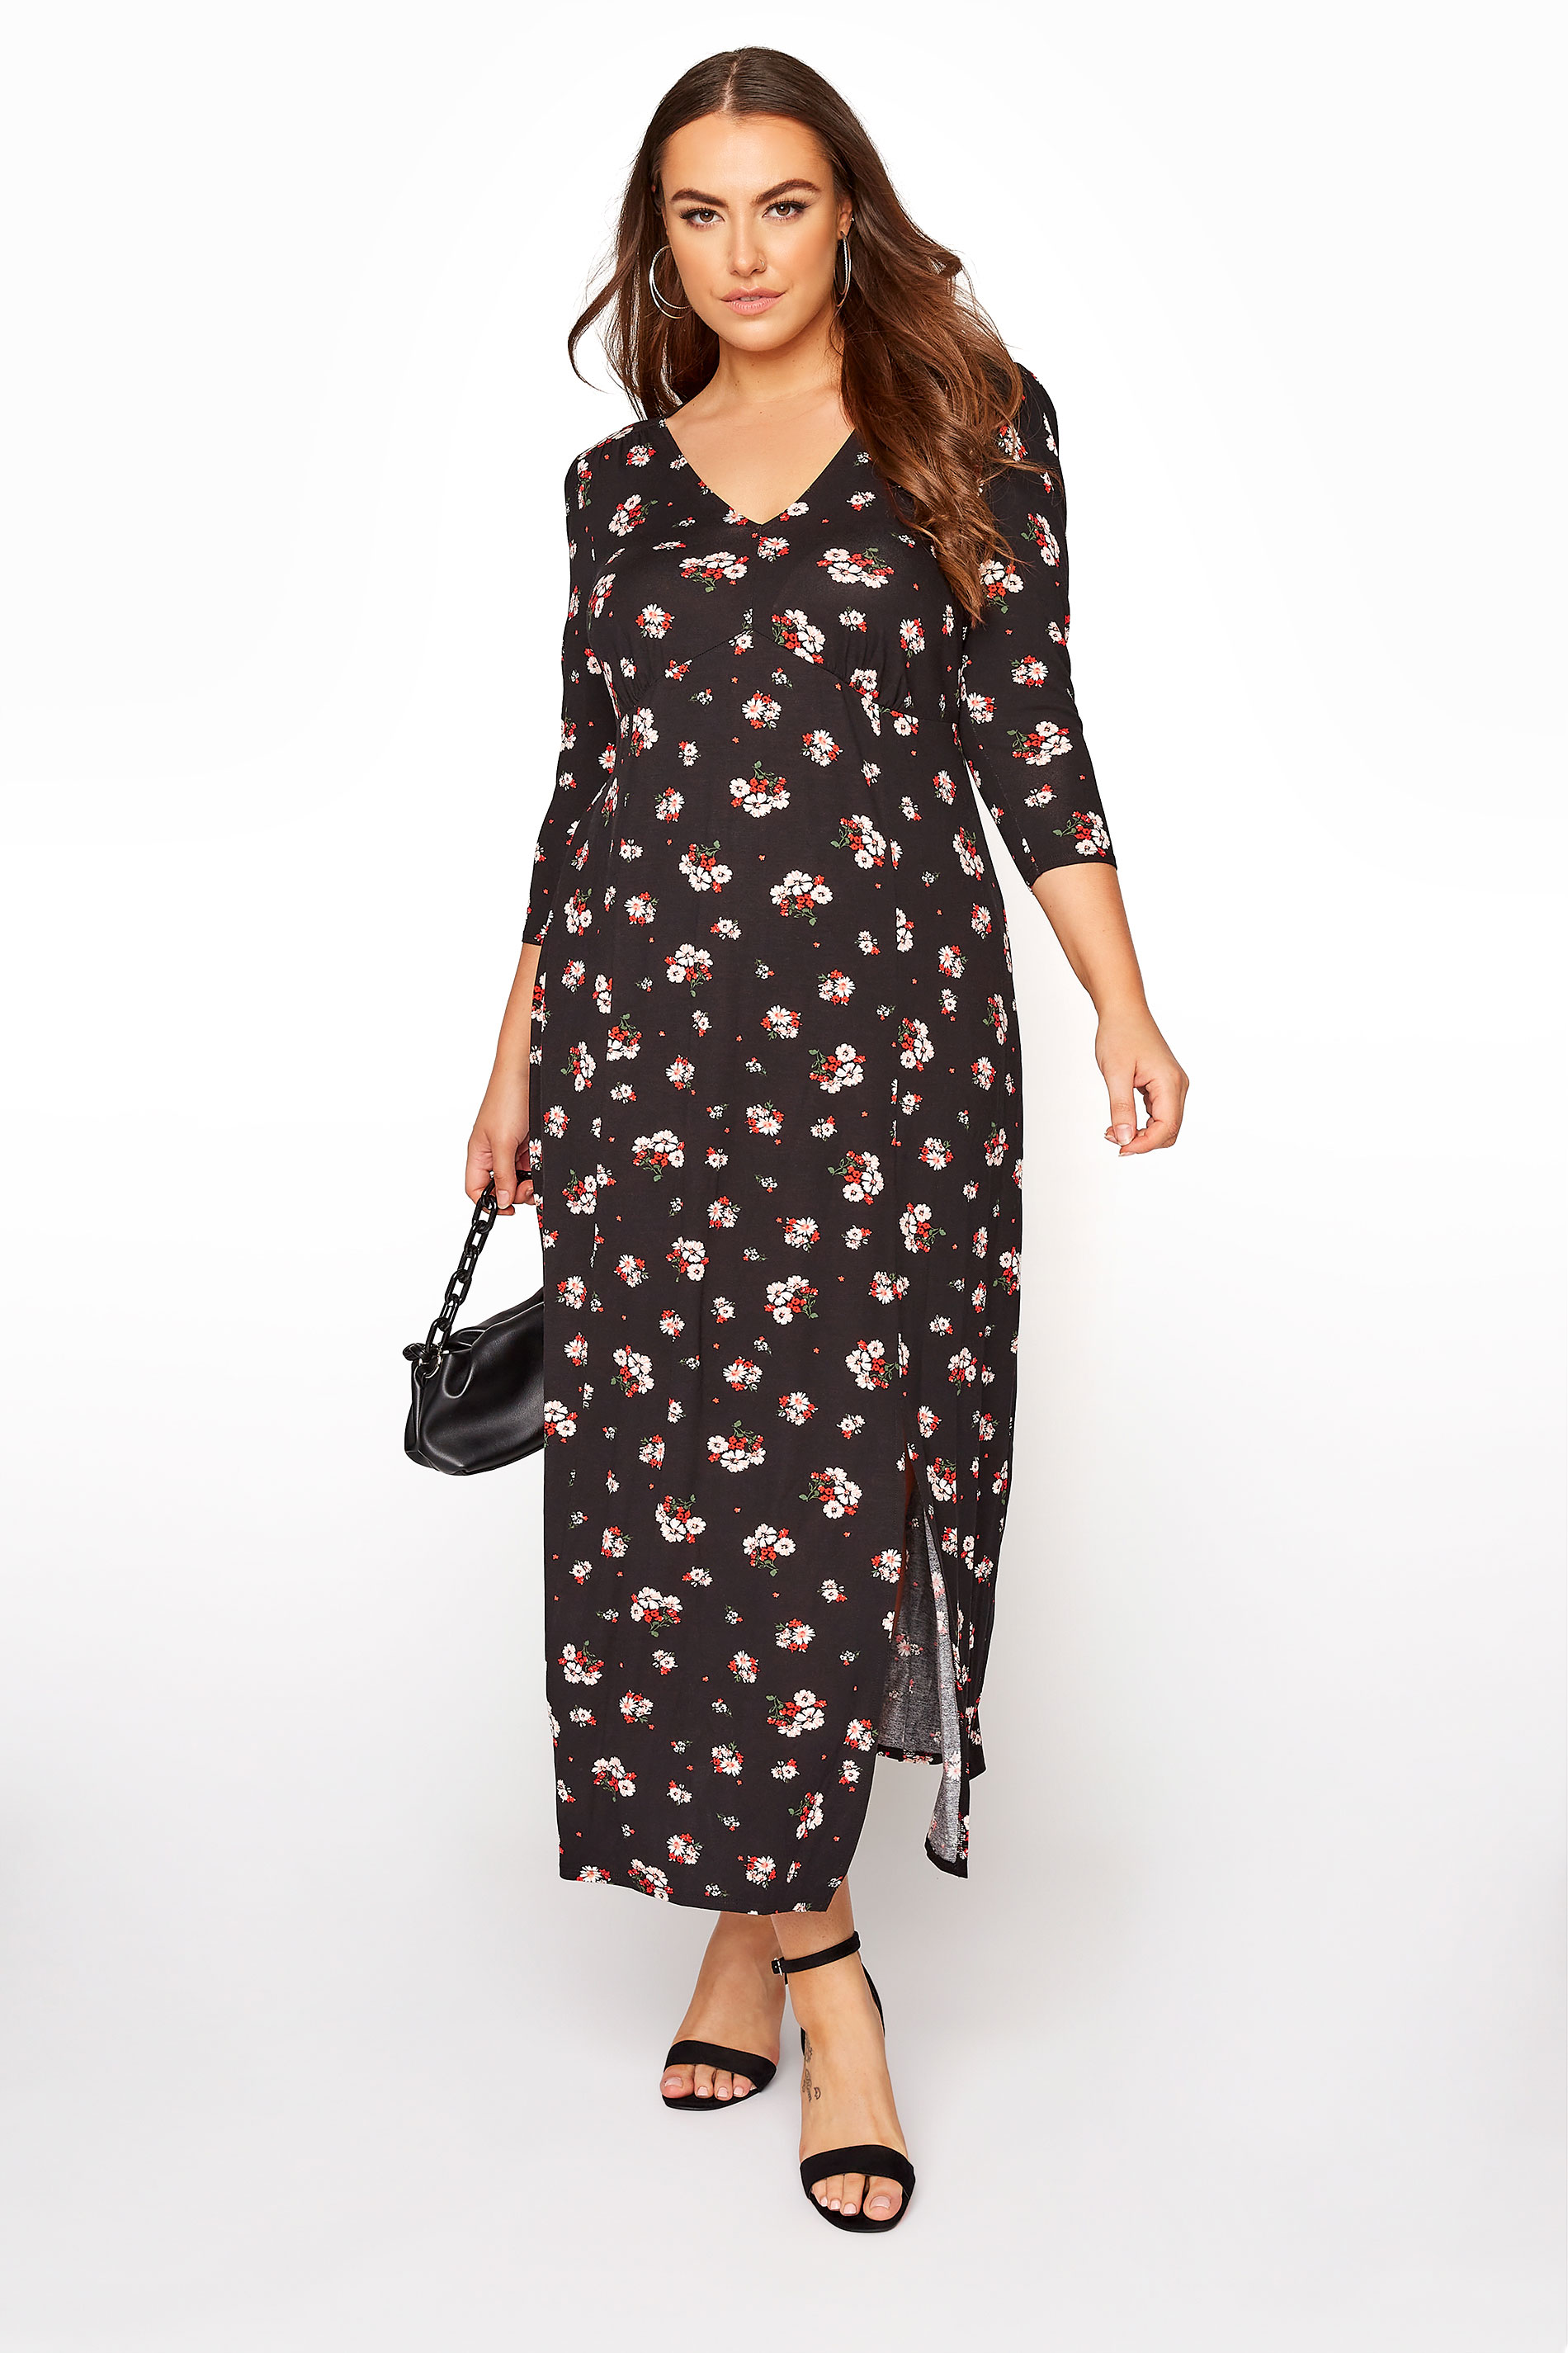 YOURS LONDON Black Floral Side Split Midaxi Dress_B.jpg